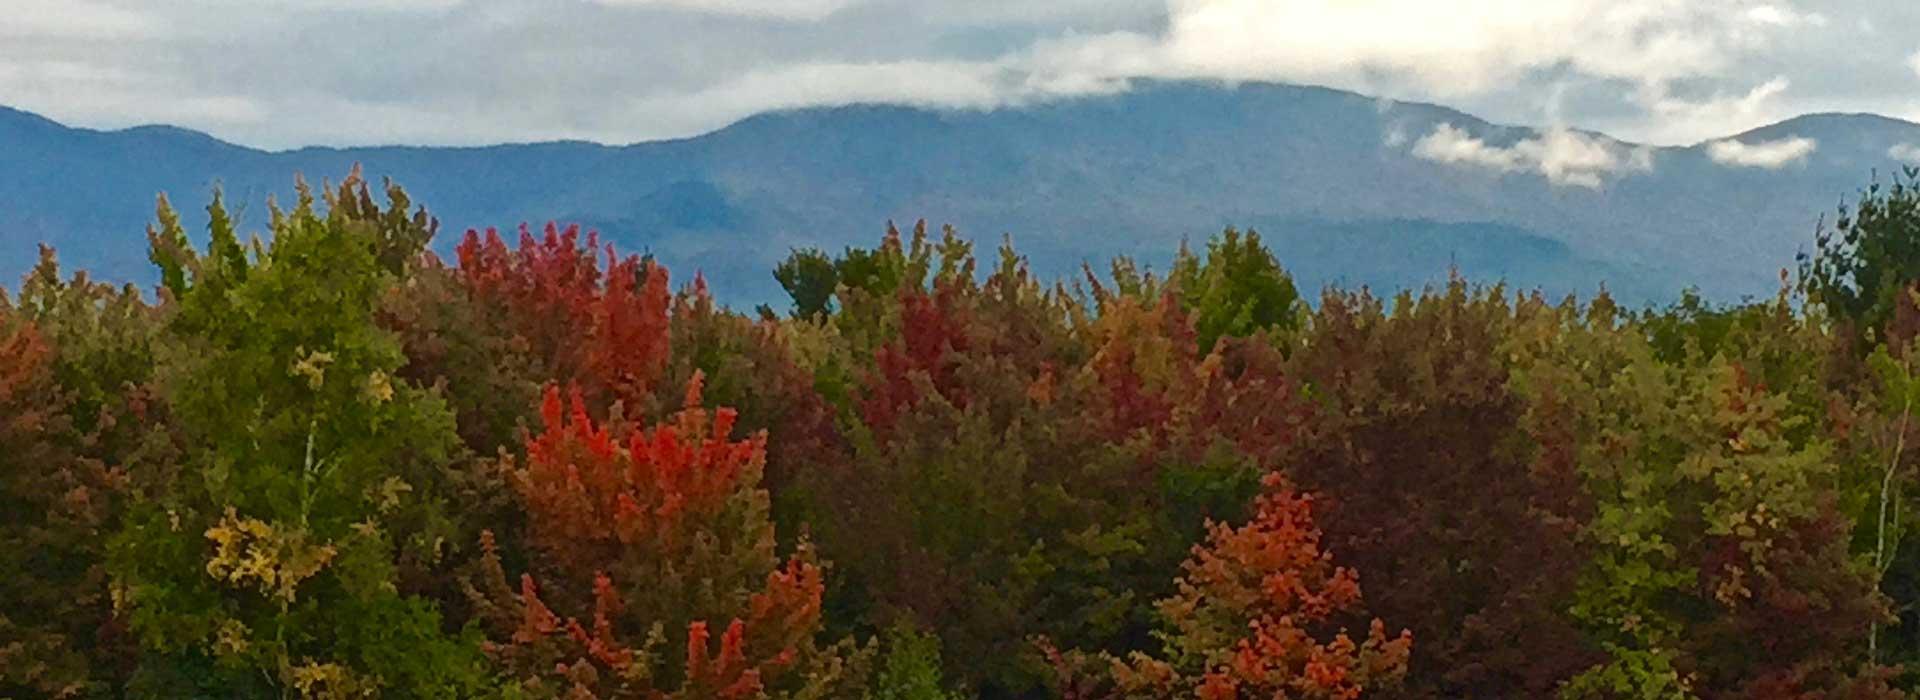 david-london-autumn-mountains